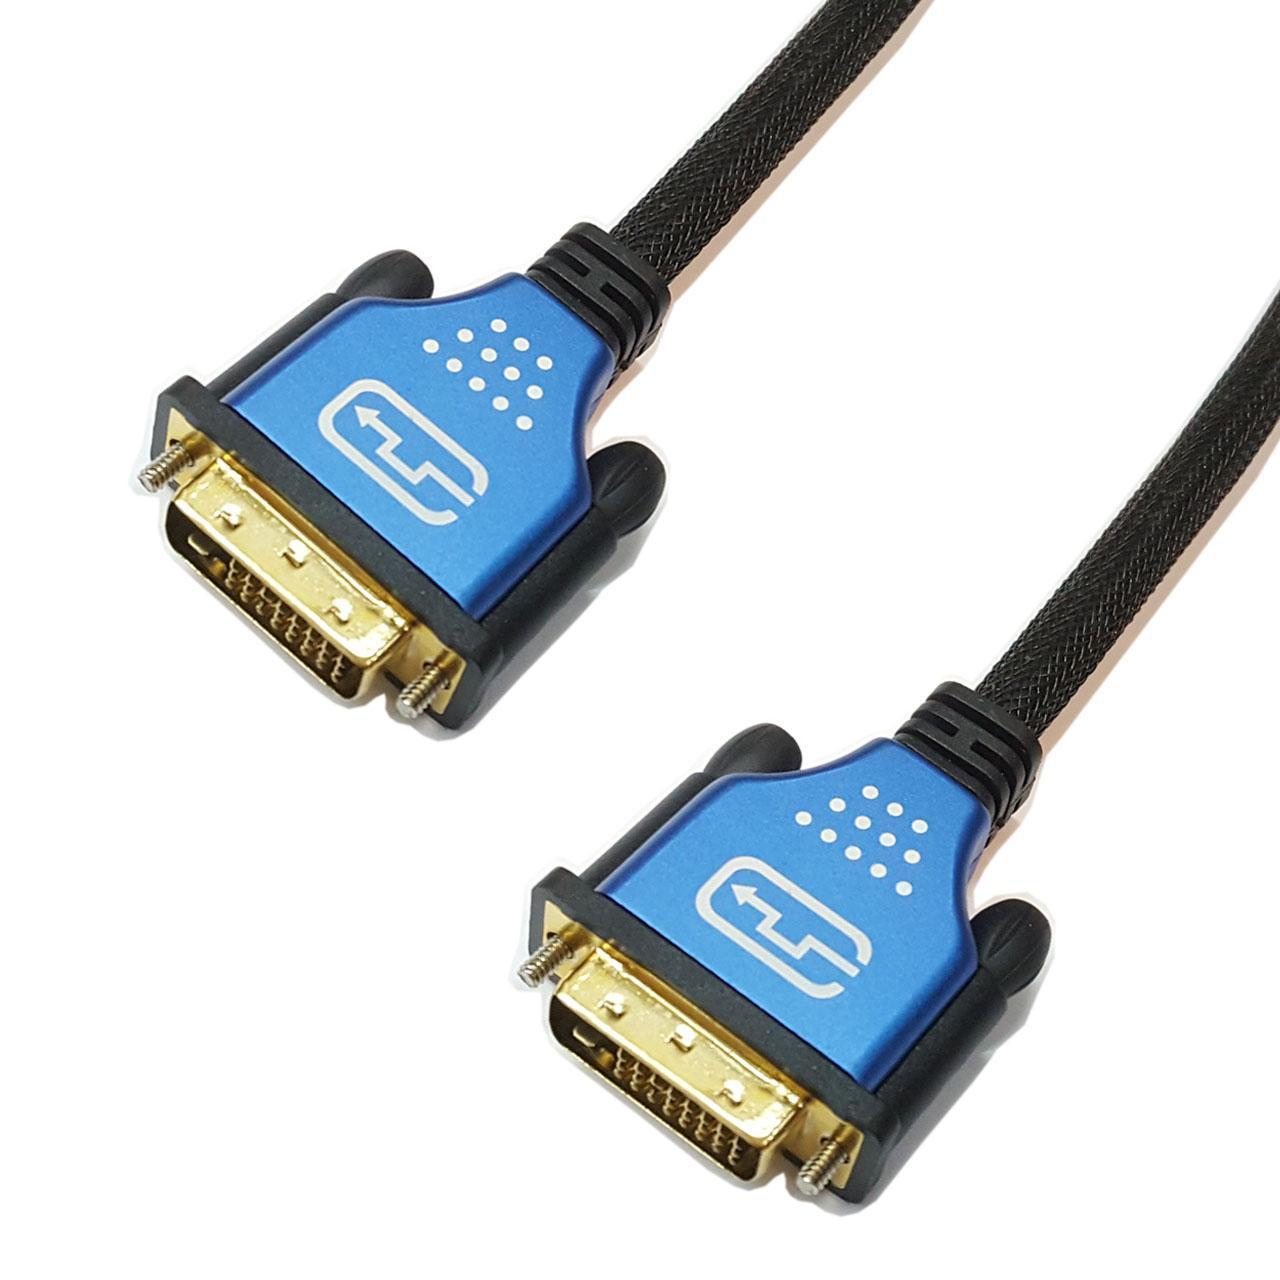 کابل DVI-D Dual link برند زیکو